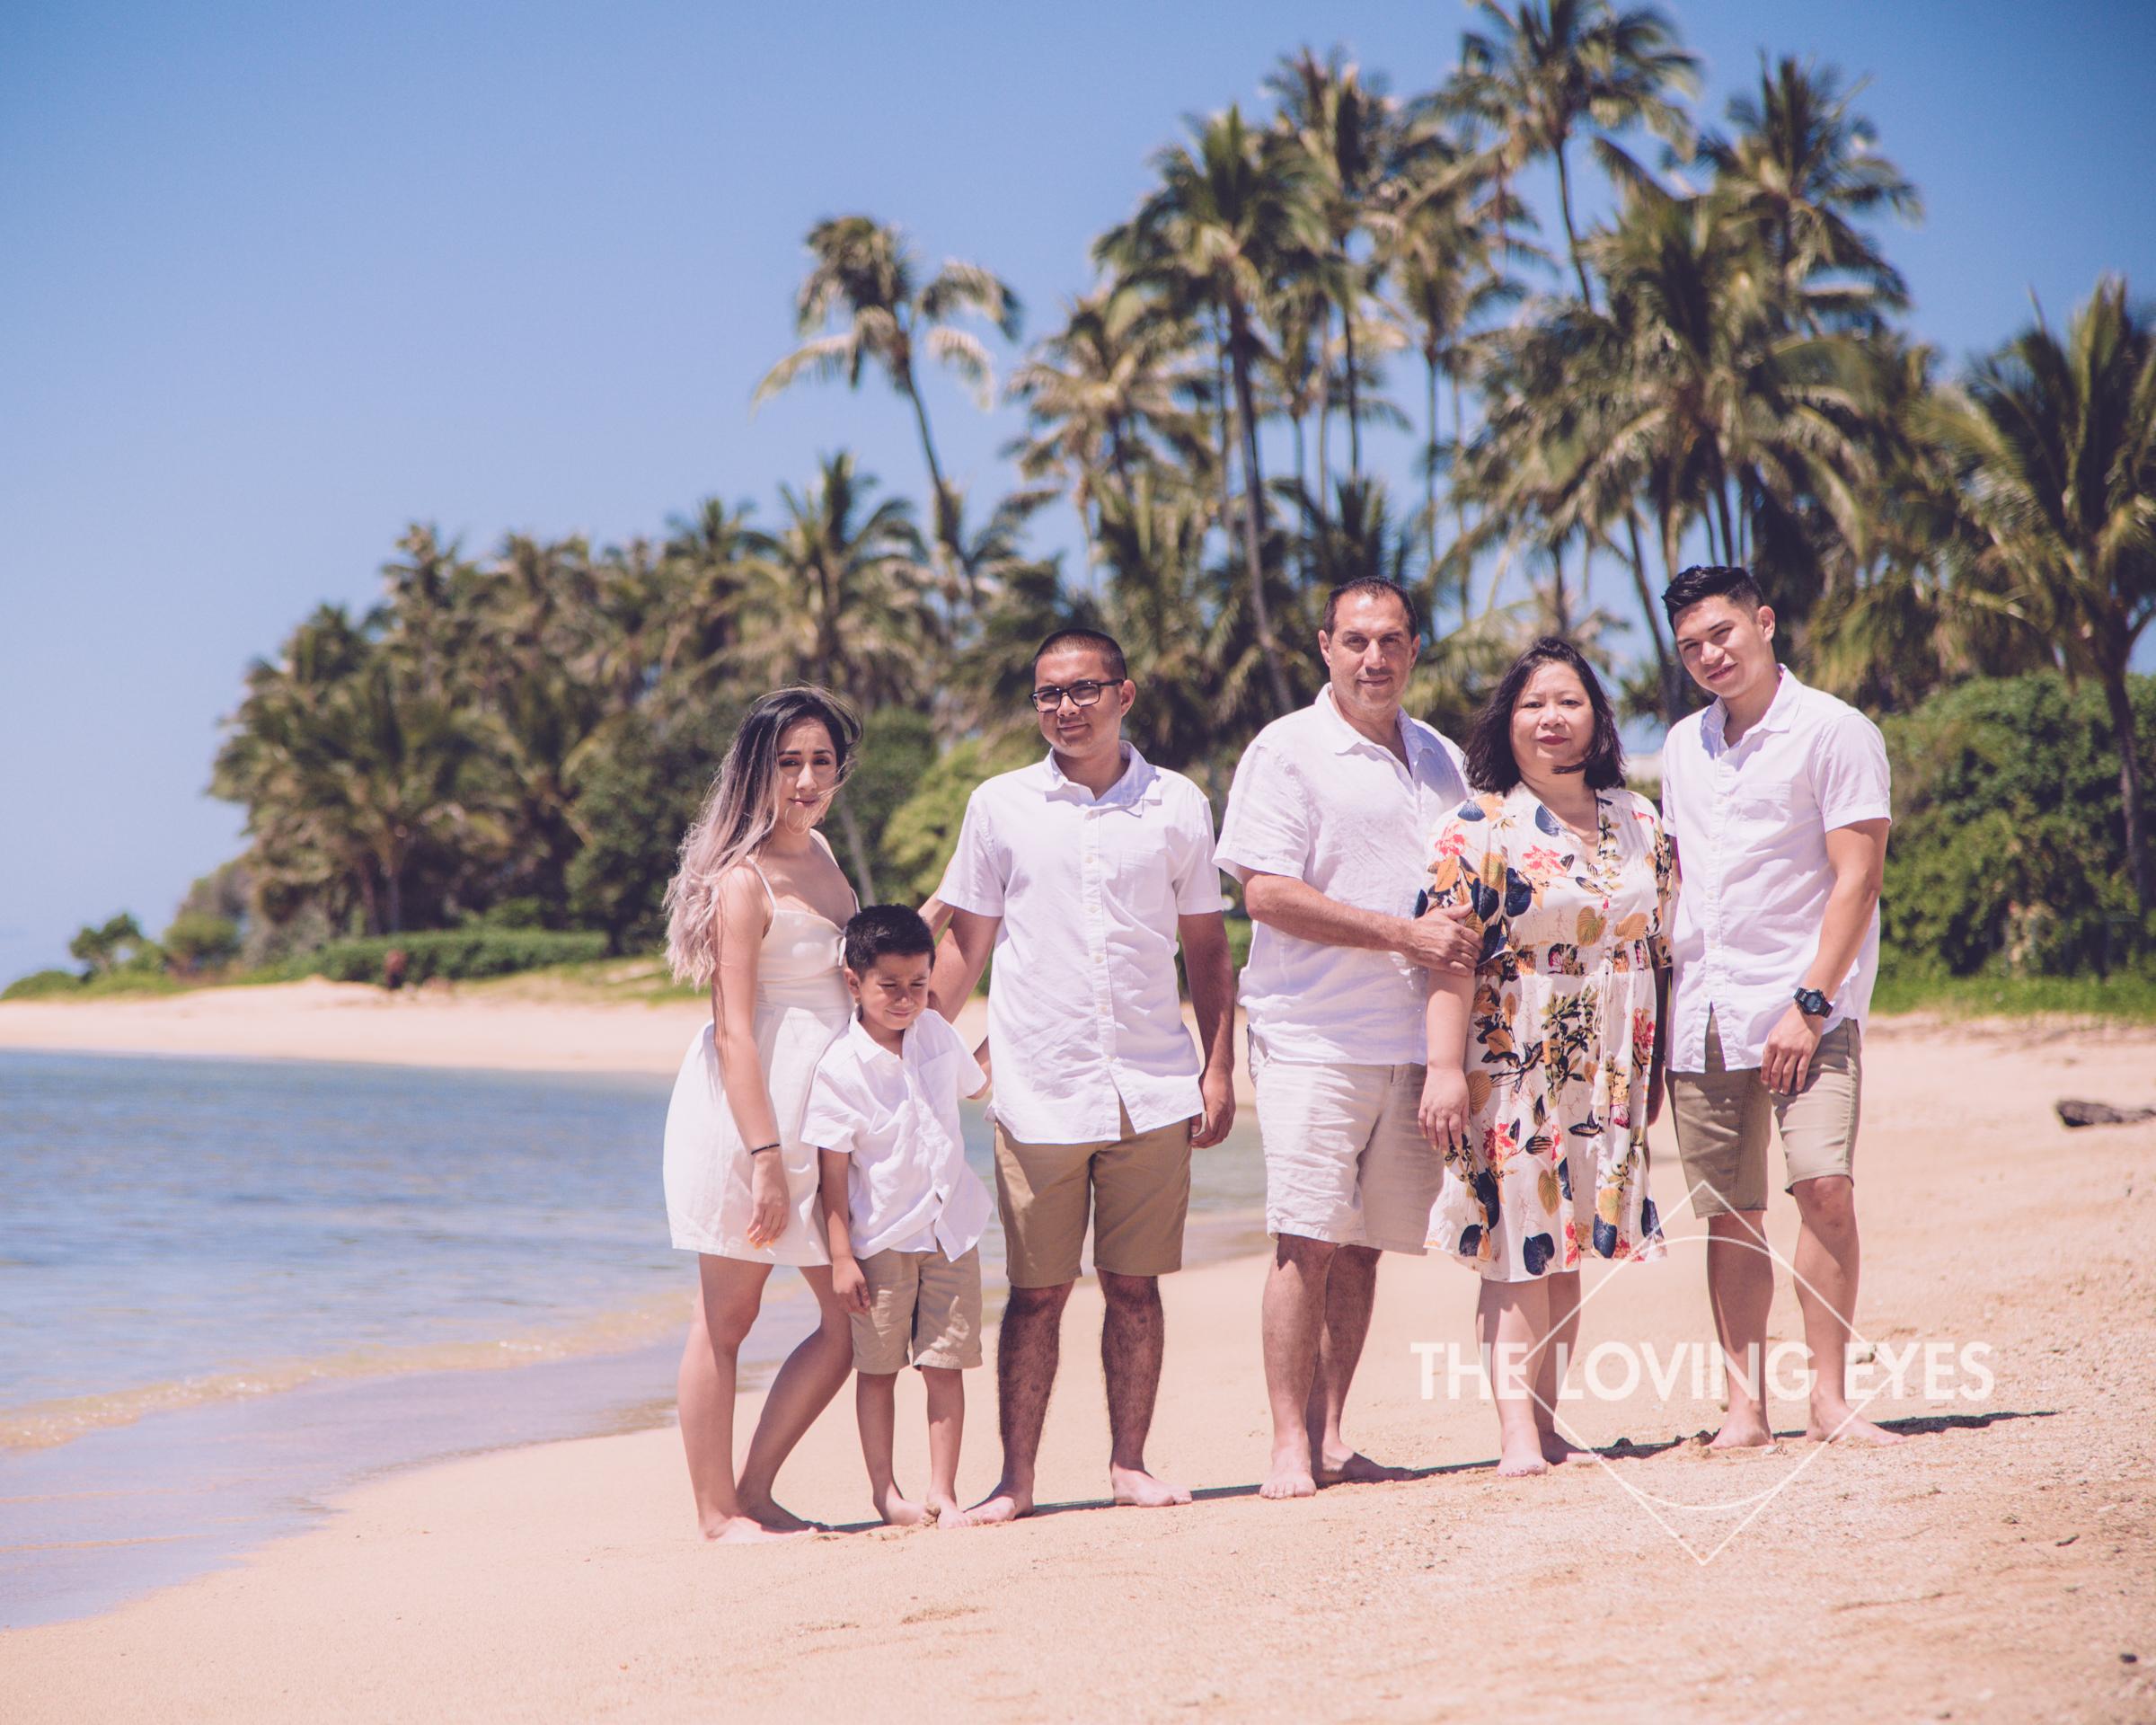 Hawaii vacation beach photo.jpg